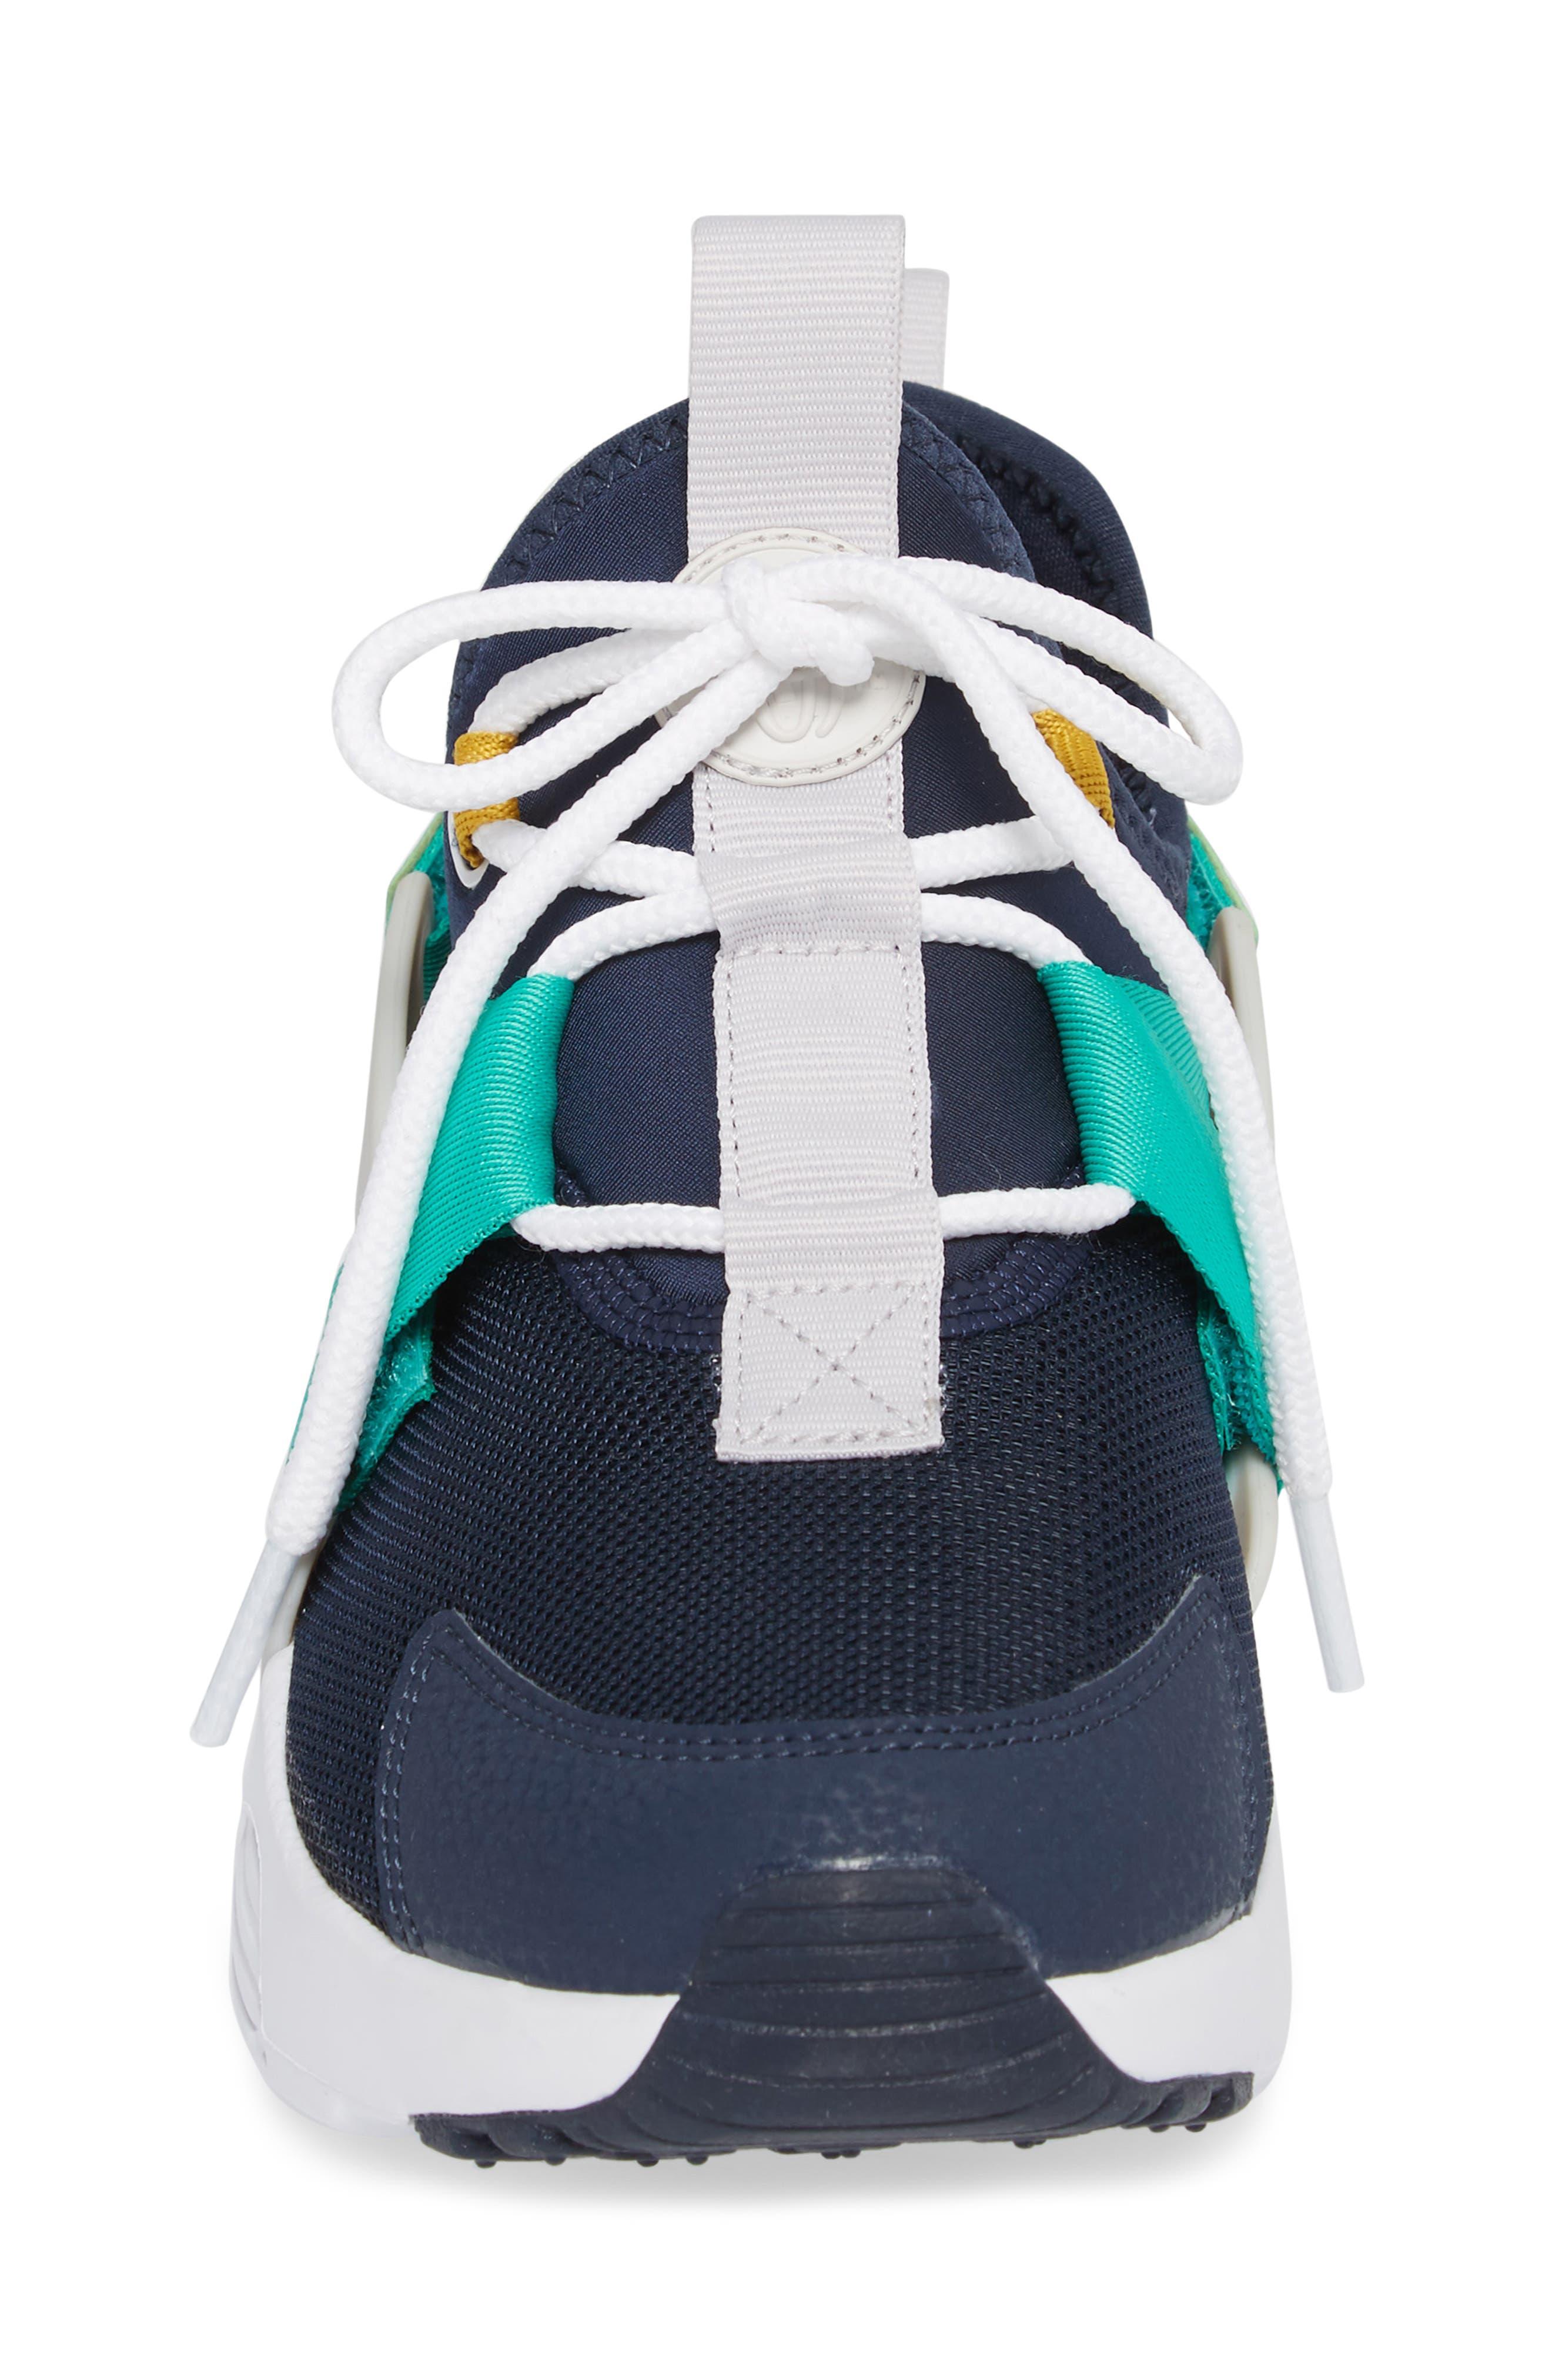 Air Huarache City Low Sneaker,                             Alternate thumbnail 4, color,                             Obsidian/ White/ Grey/ Green